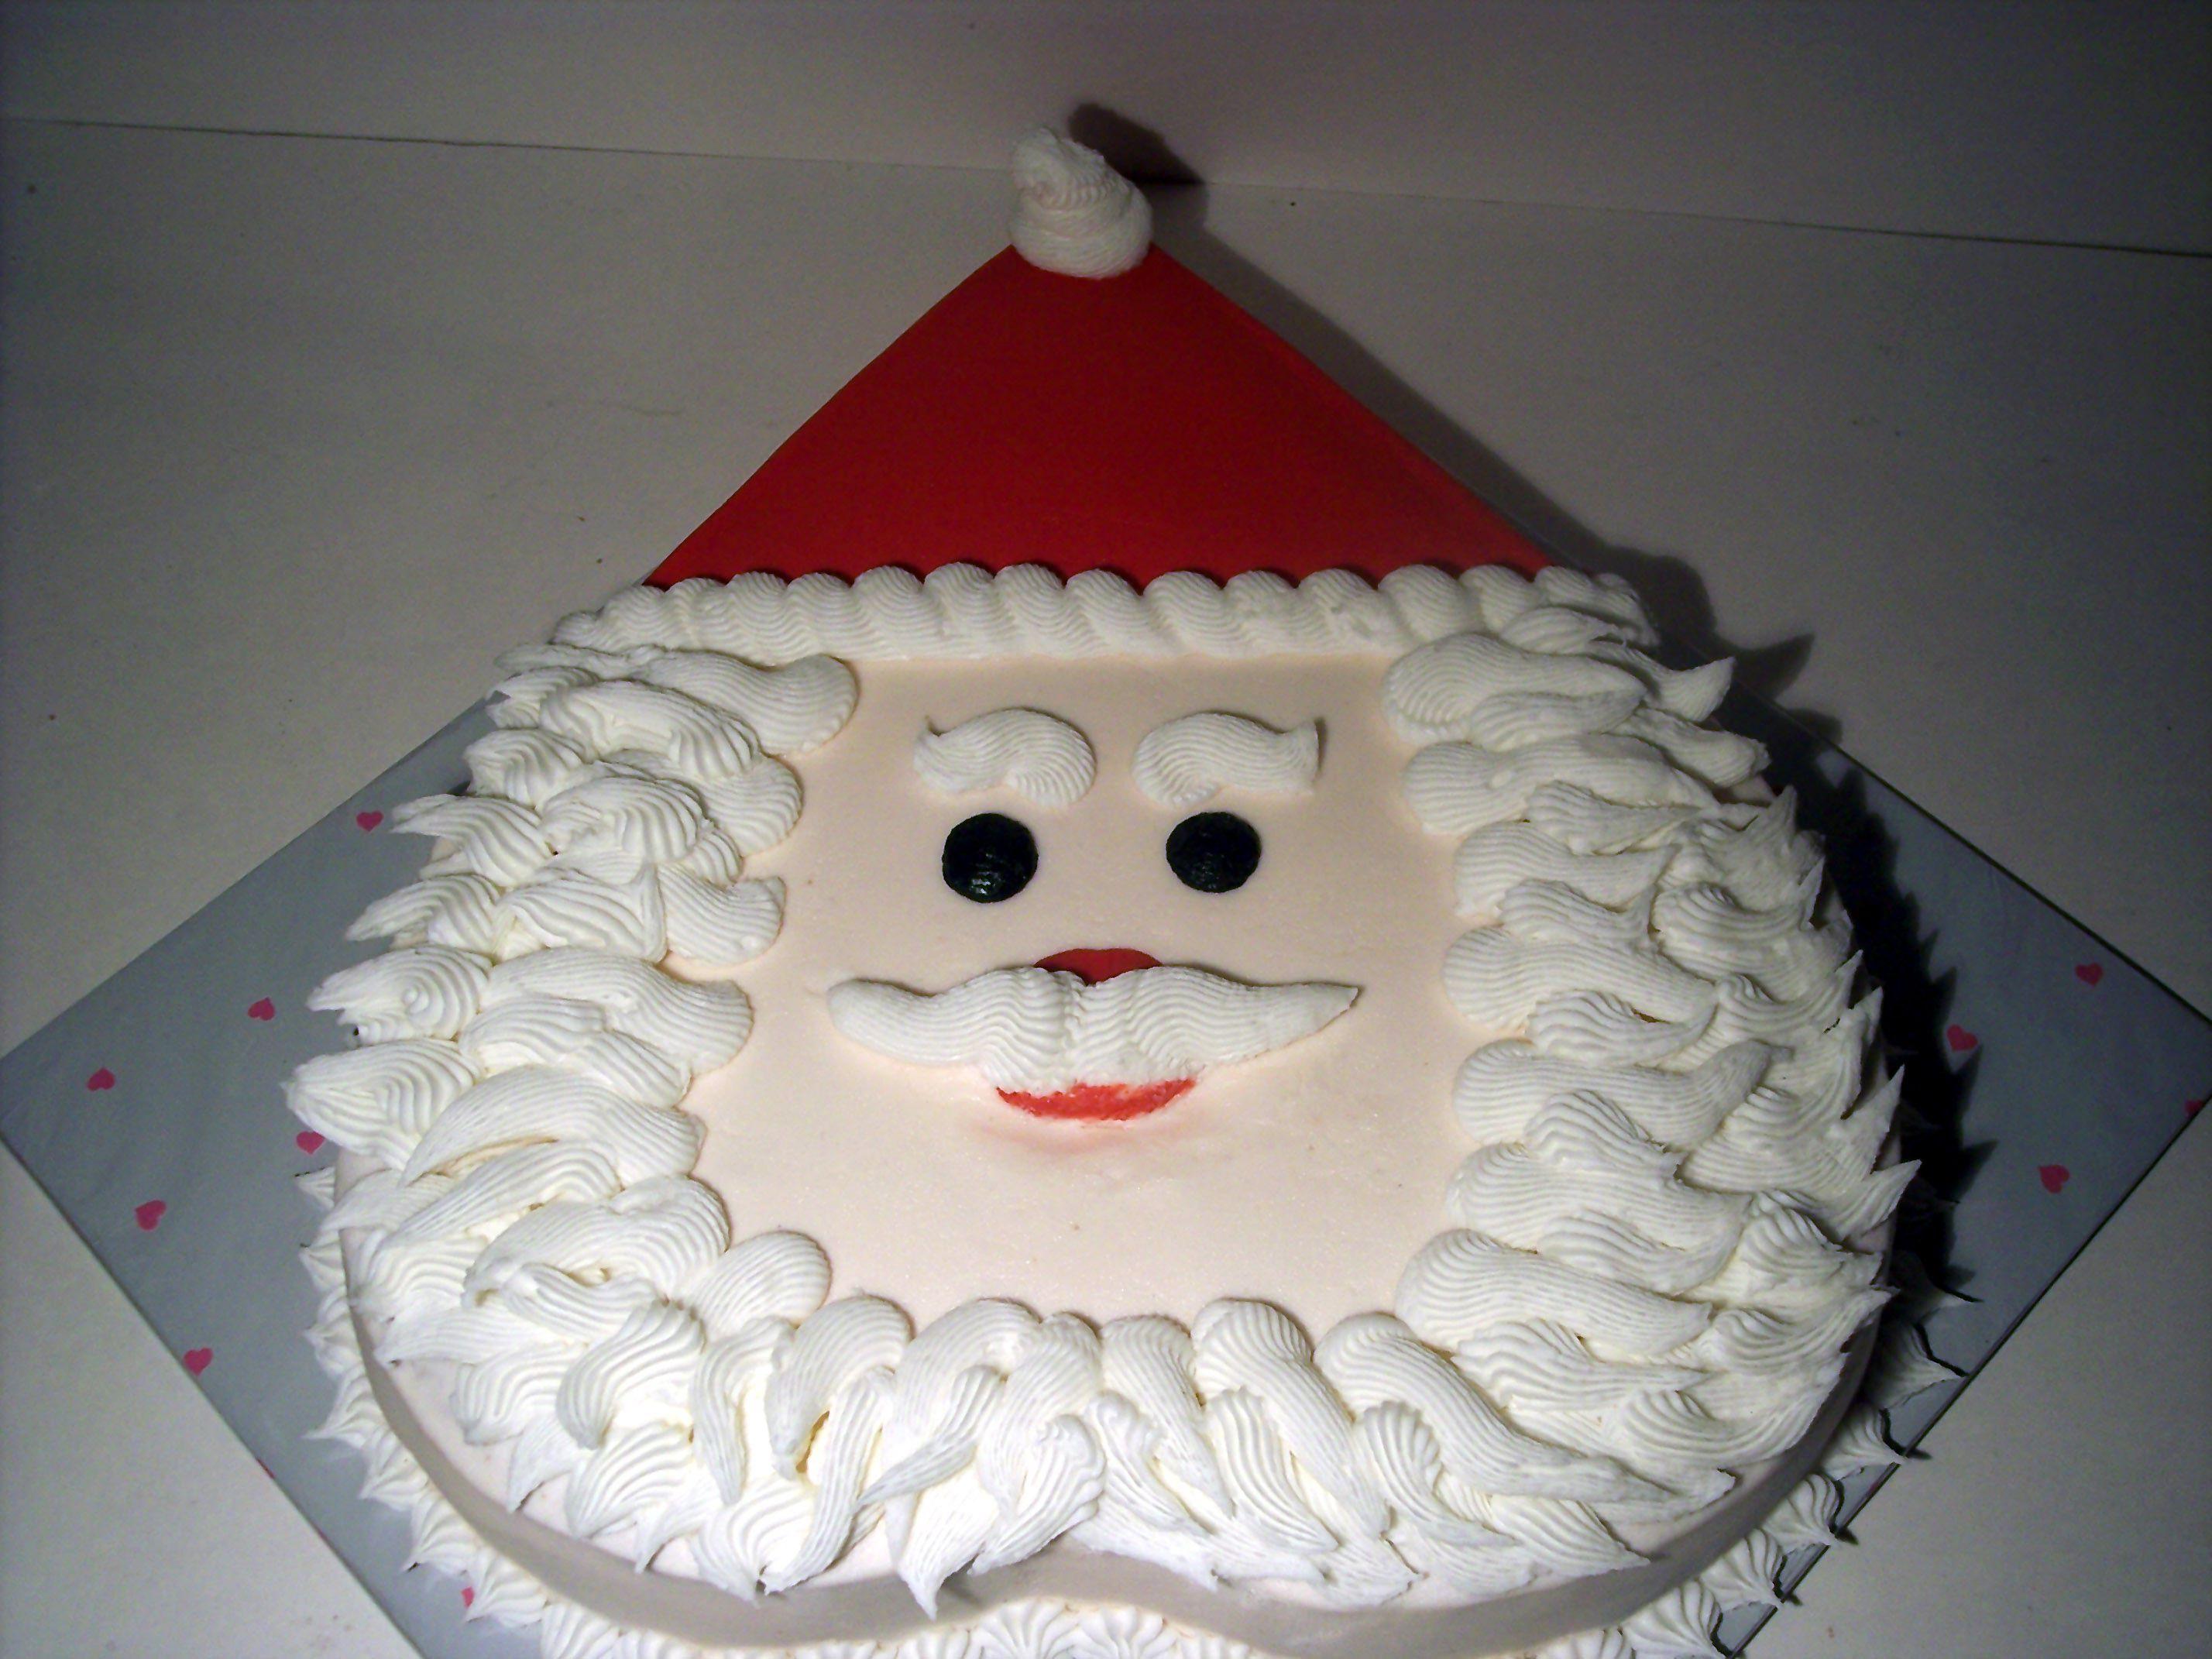 How to make a father christmas cake decoration - Christmas Cake Santa 103